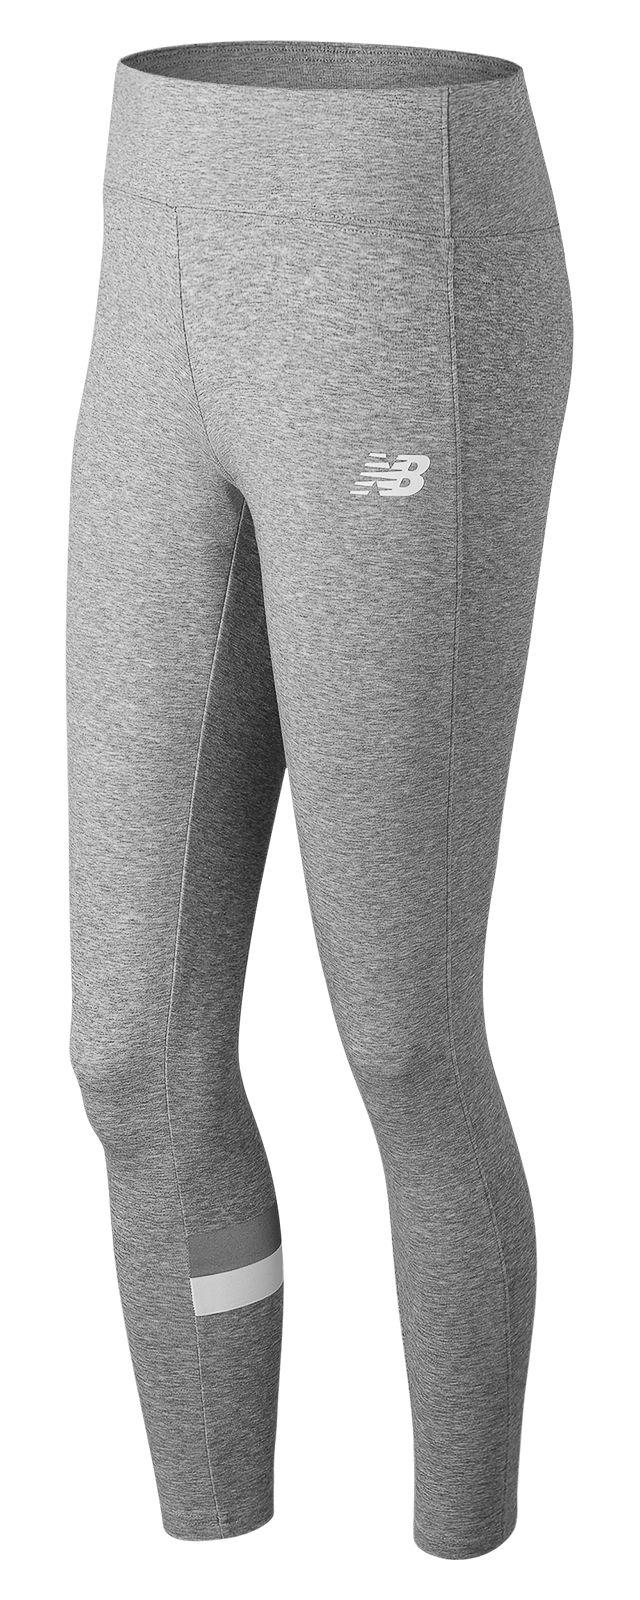 Women's NB Athletics Legging